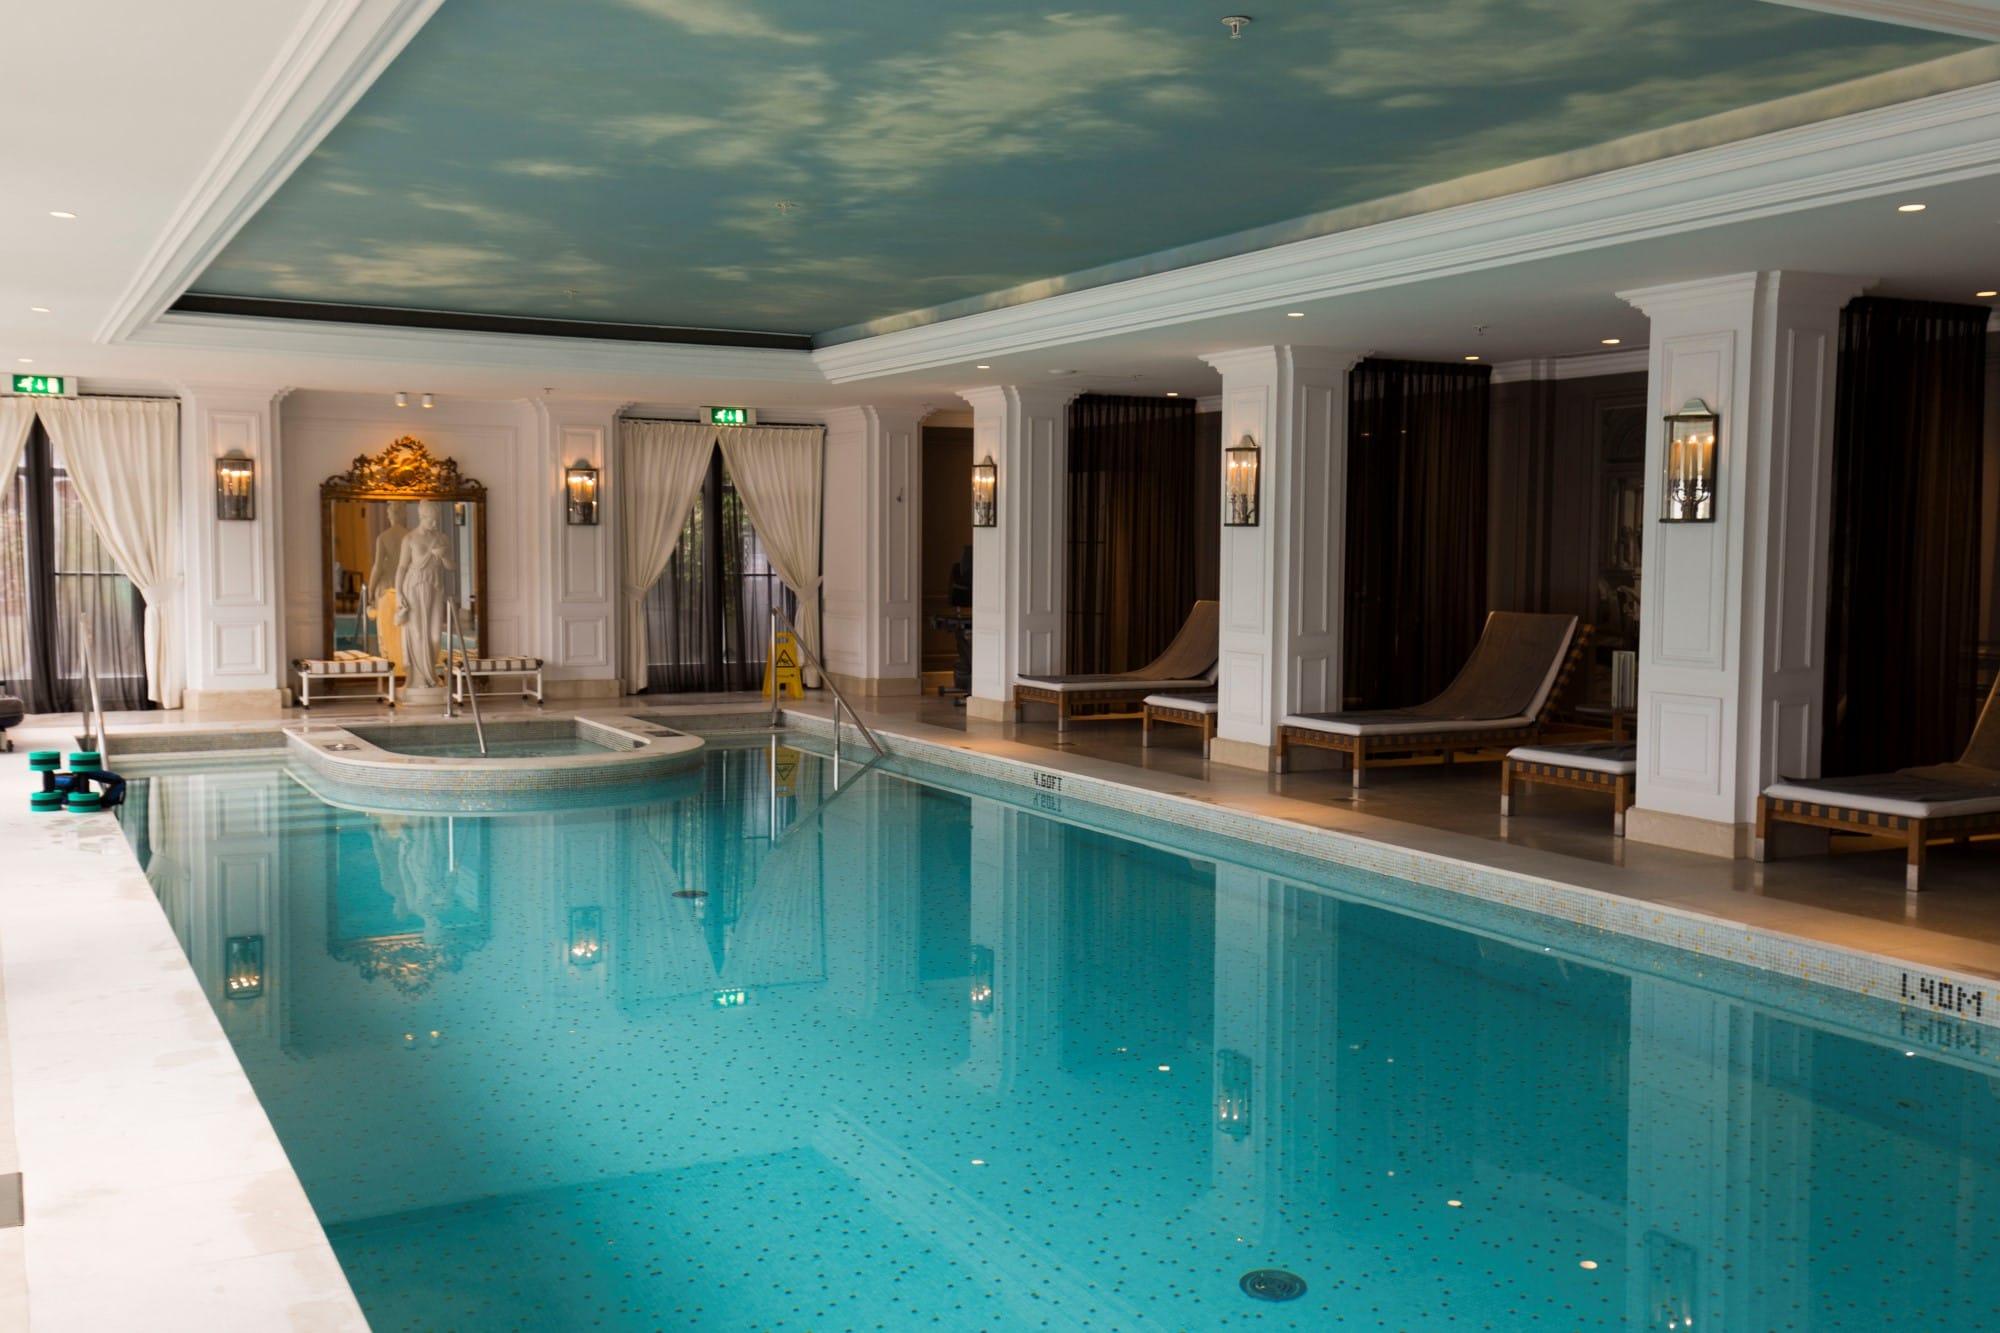 Img 9564 20150208 amstel hotel 021 chris travel blog - Amstel hotel amsterdam ...